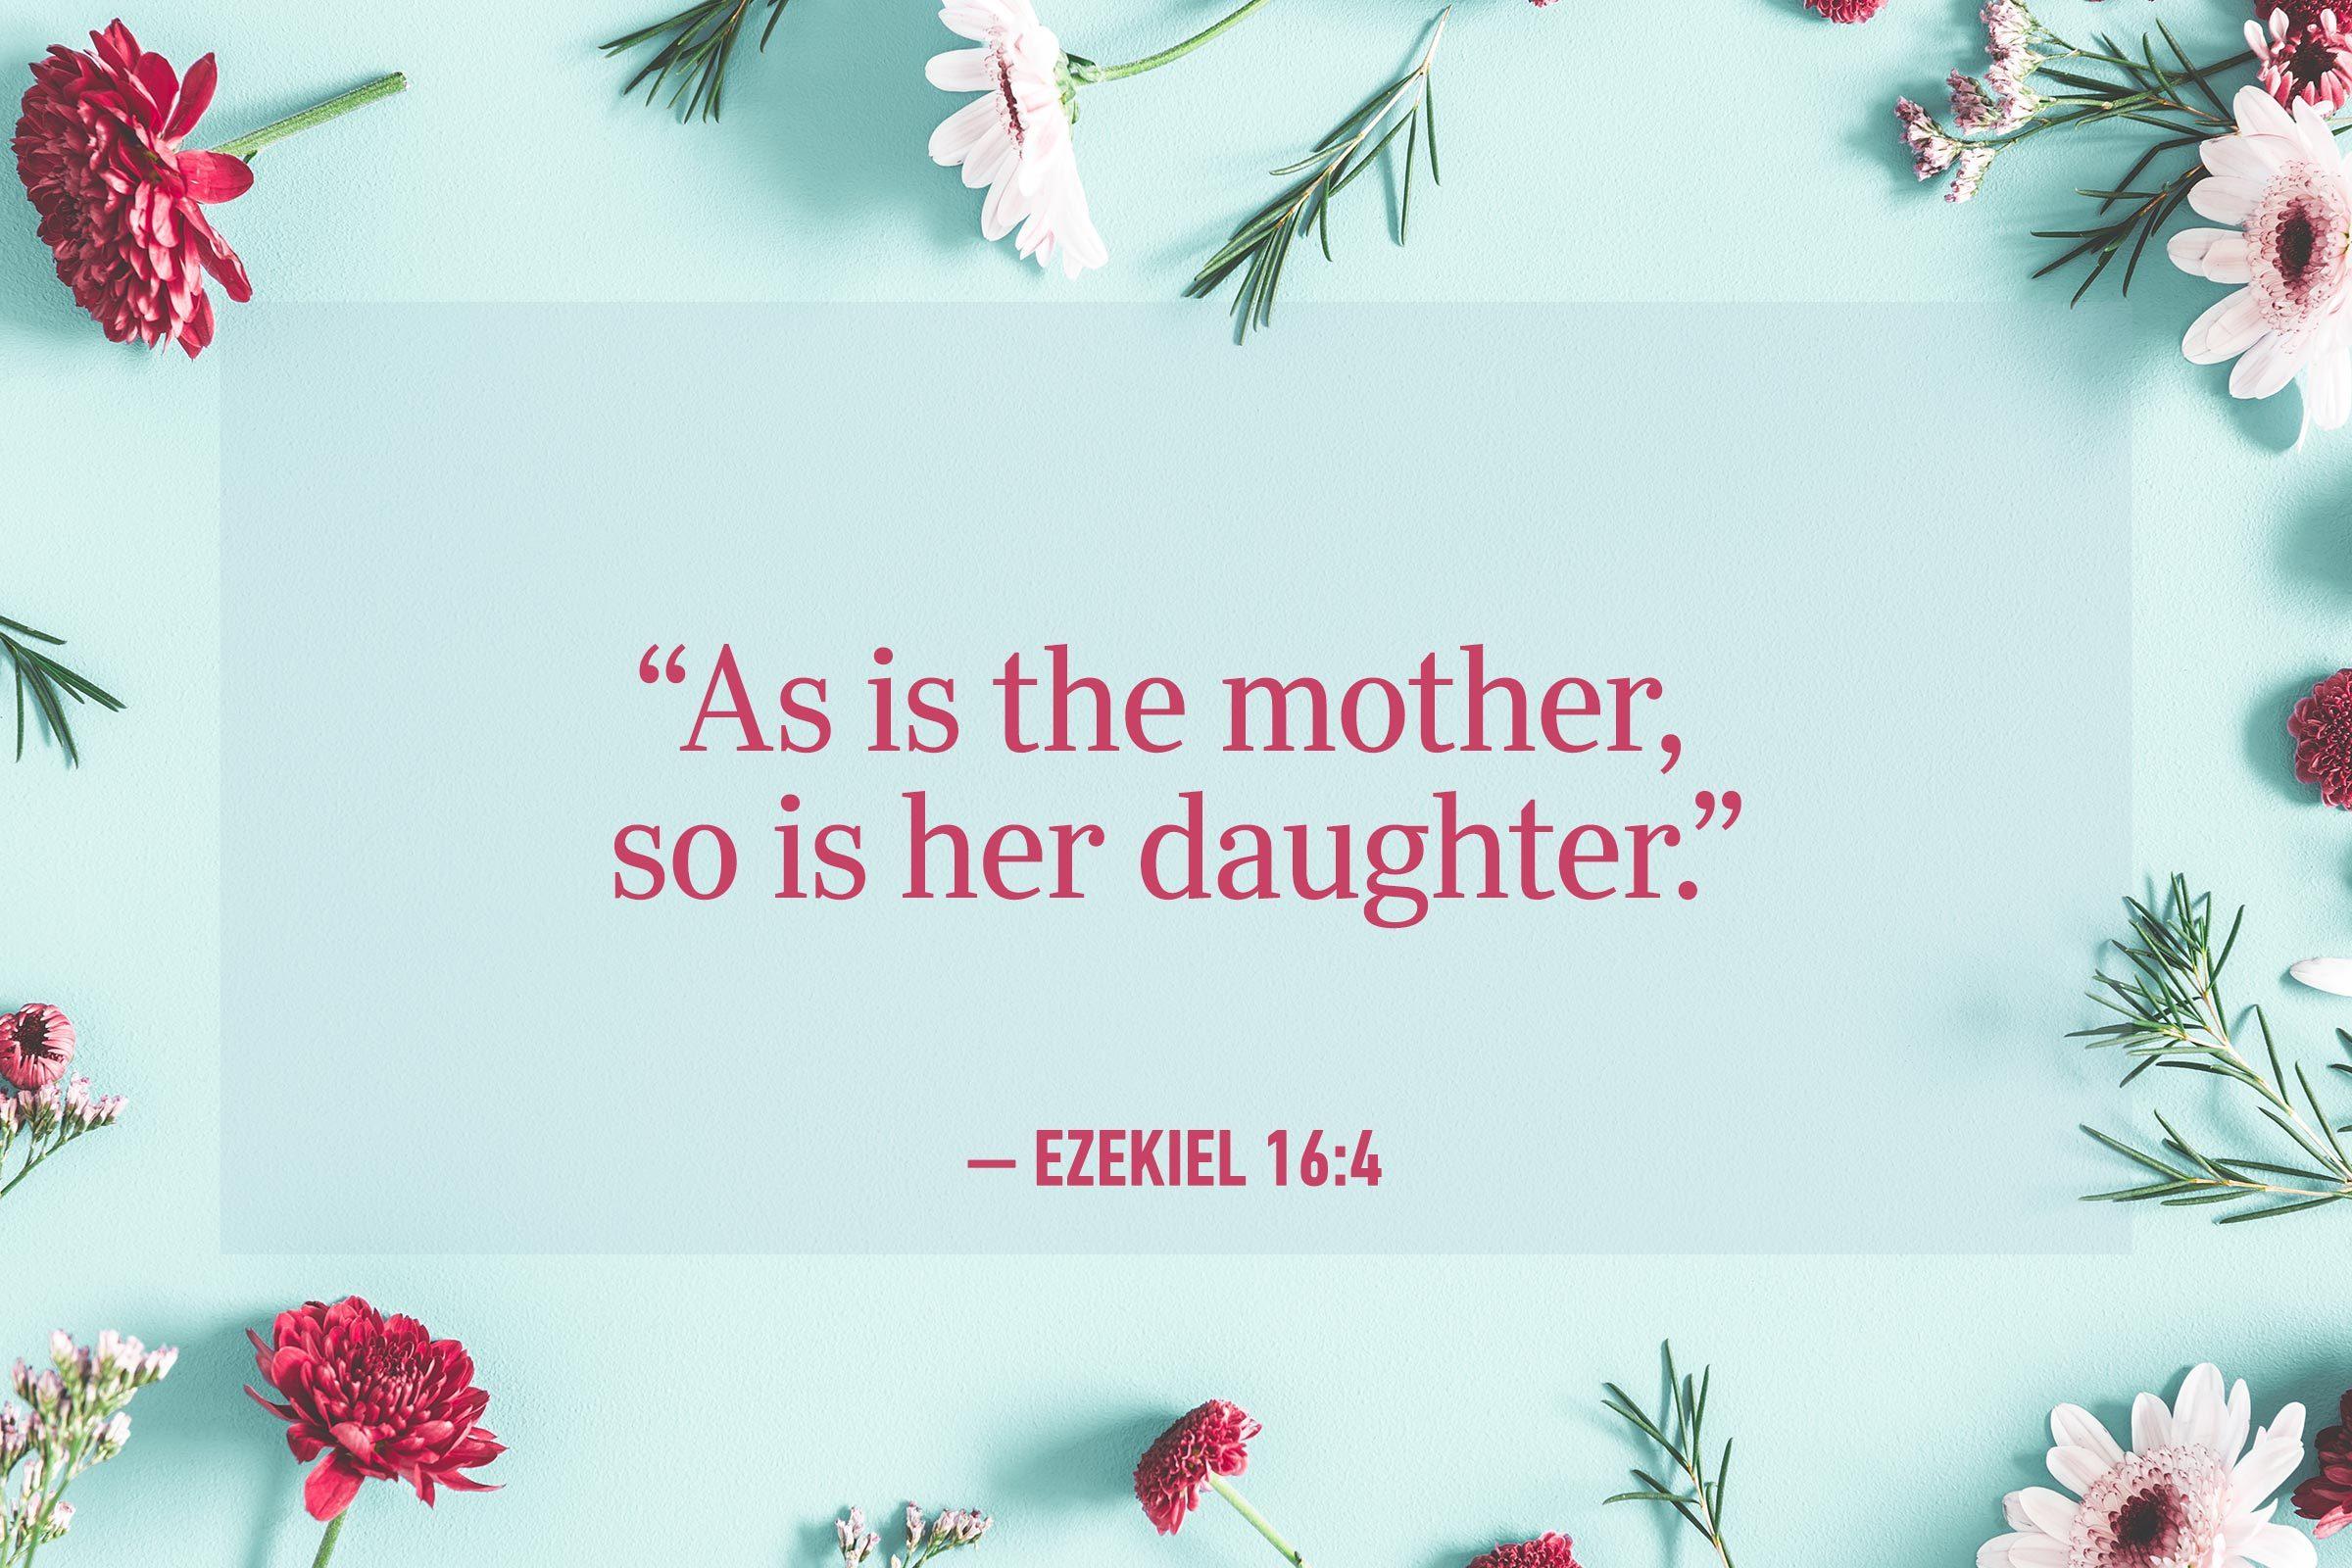 """As is the mother, so is her daughter."" —Ezekiel 16:4"